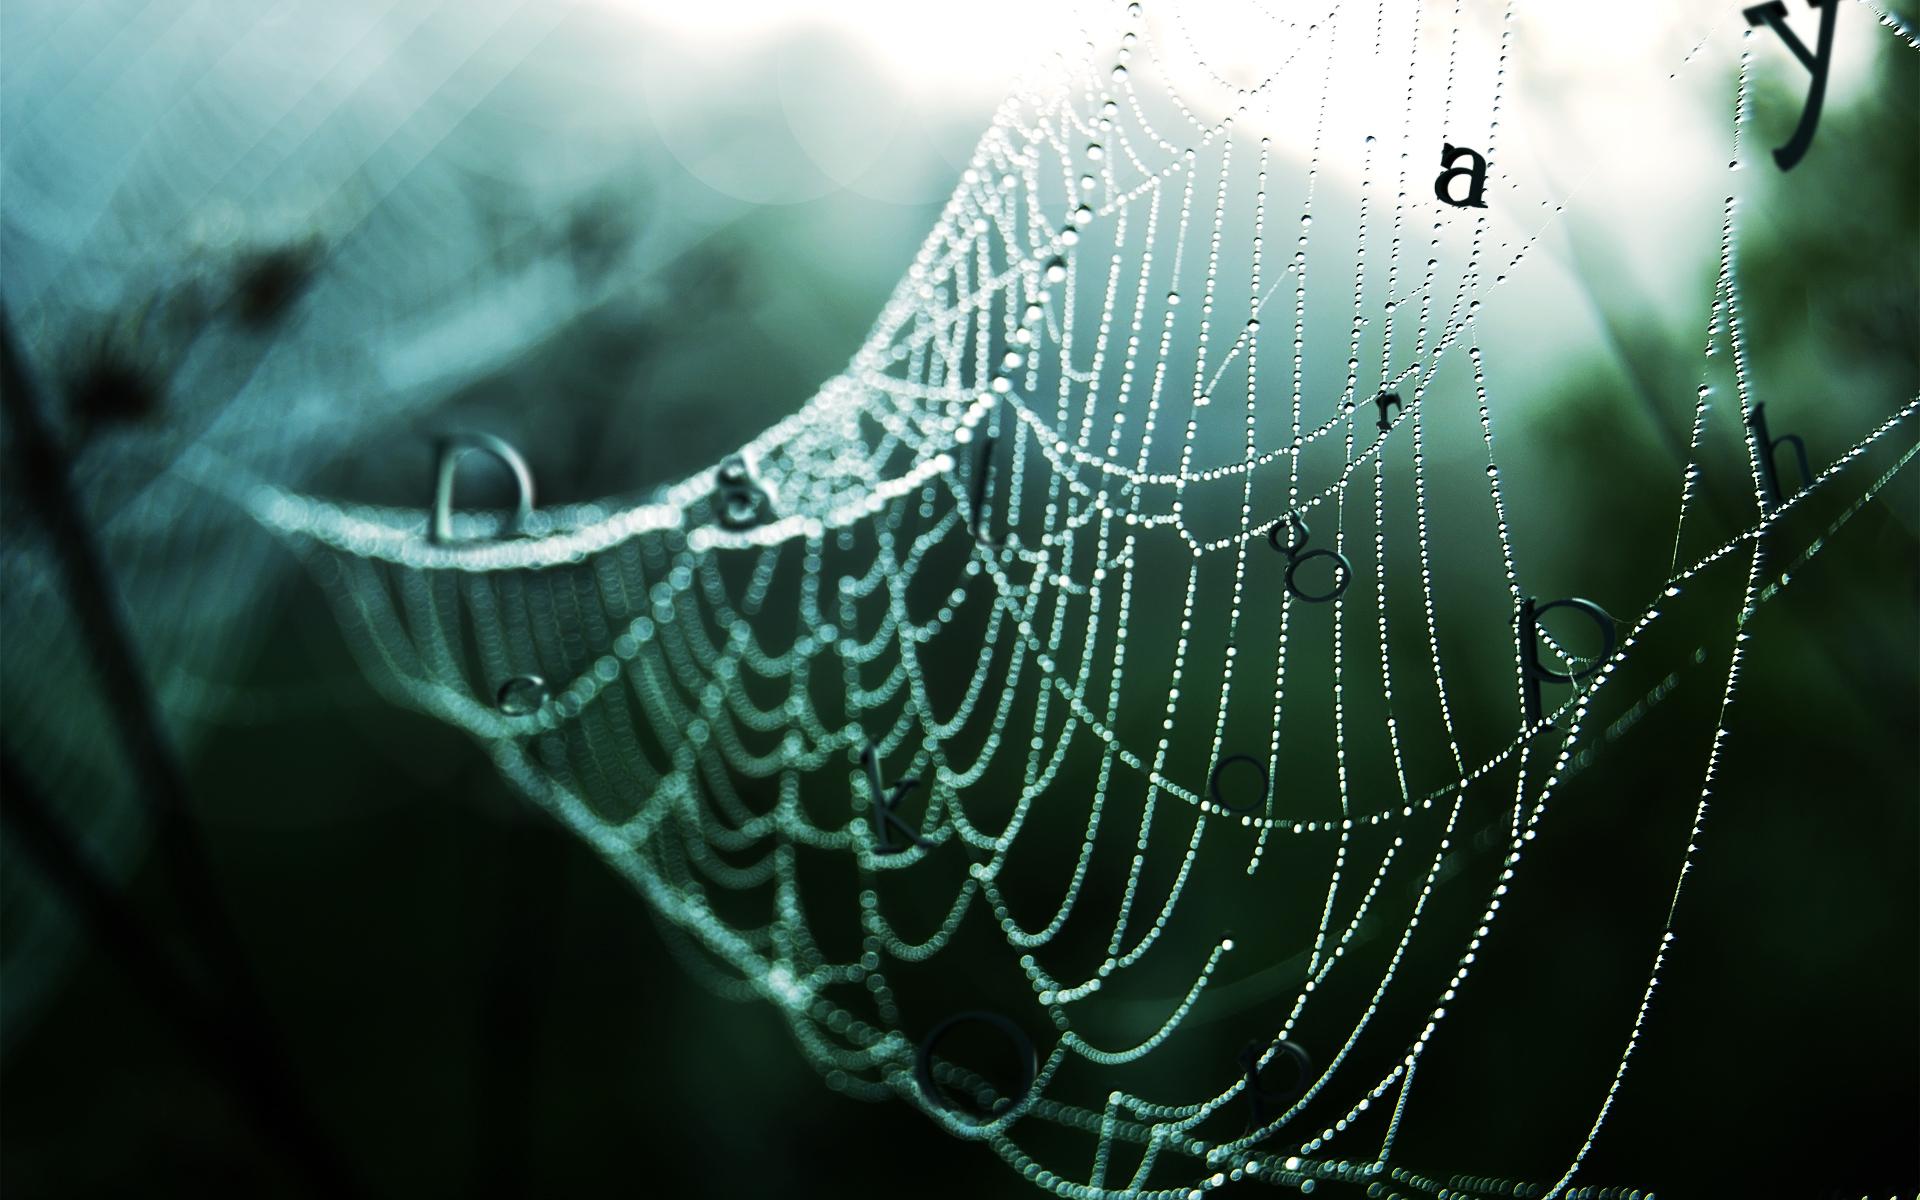 Spider on a web Wallpaper Wallpapers   High resolution Desktop 1920x1200